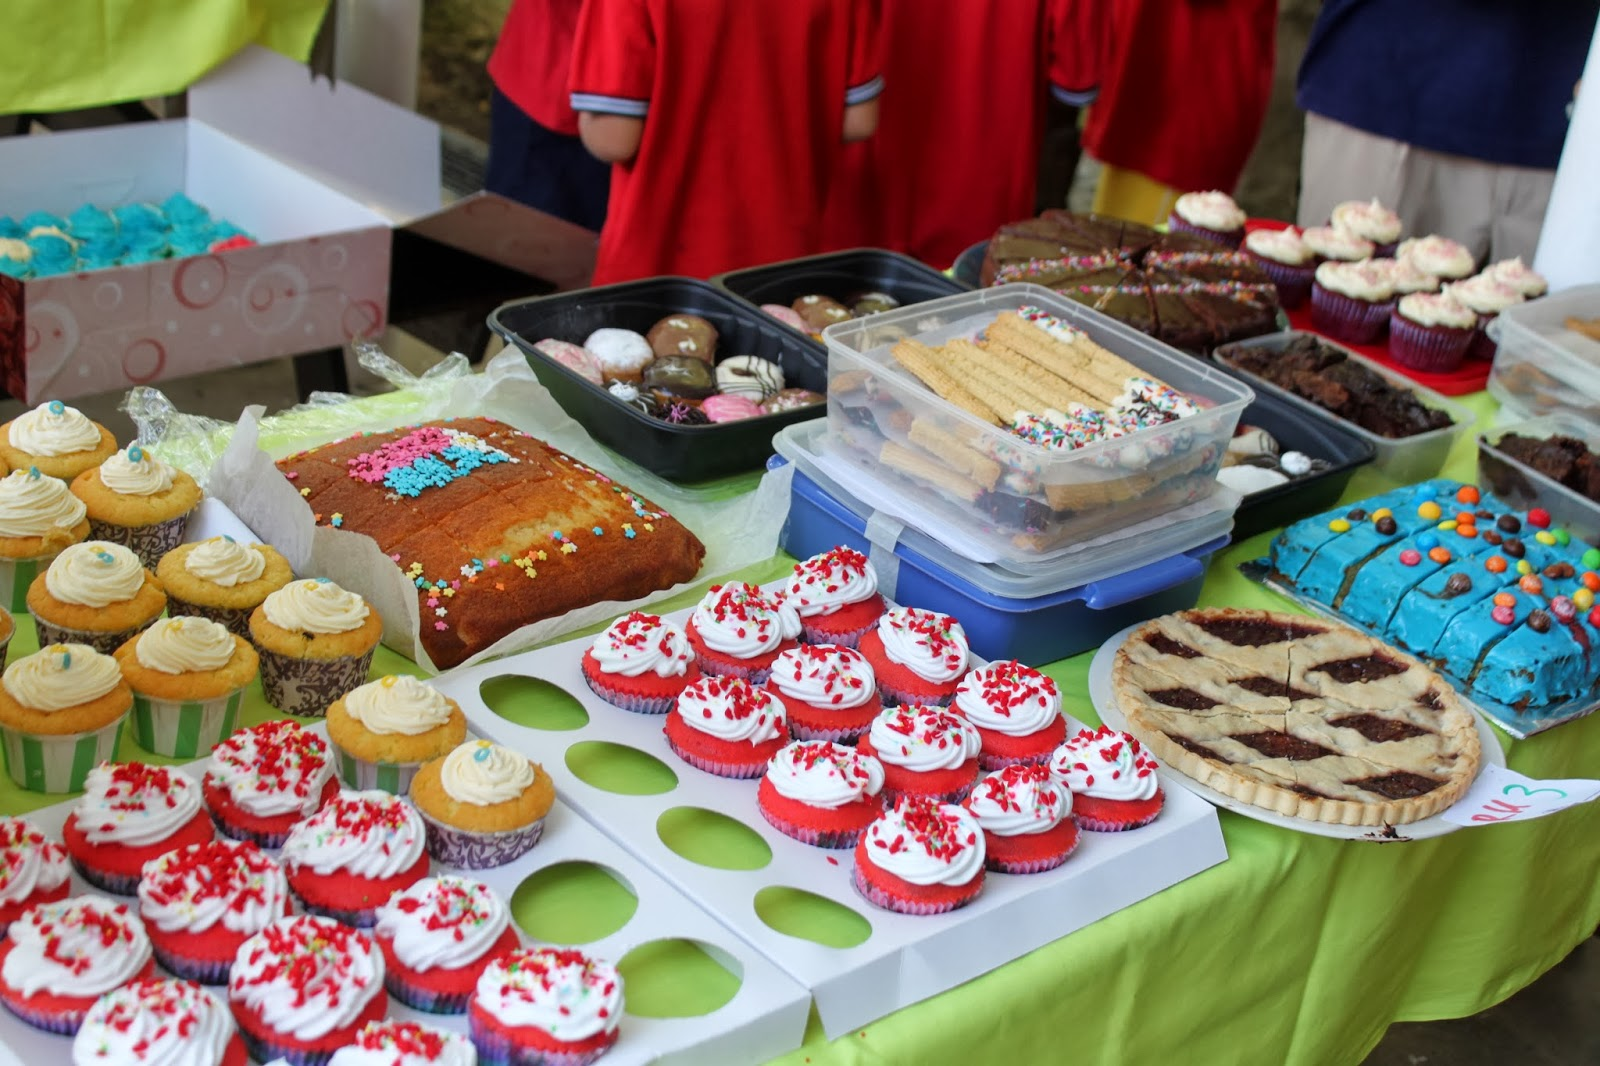 Cake Bake For Charity